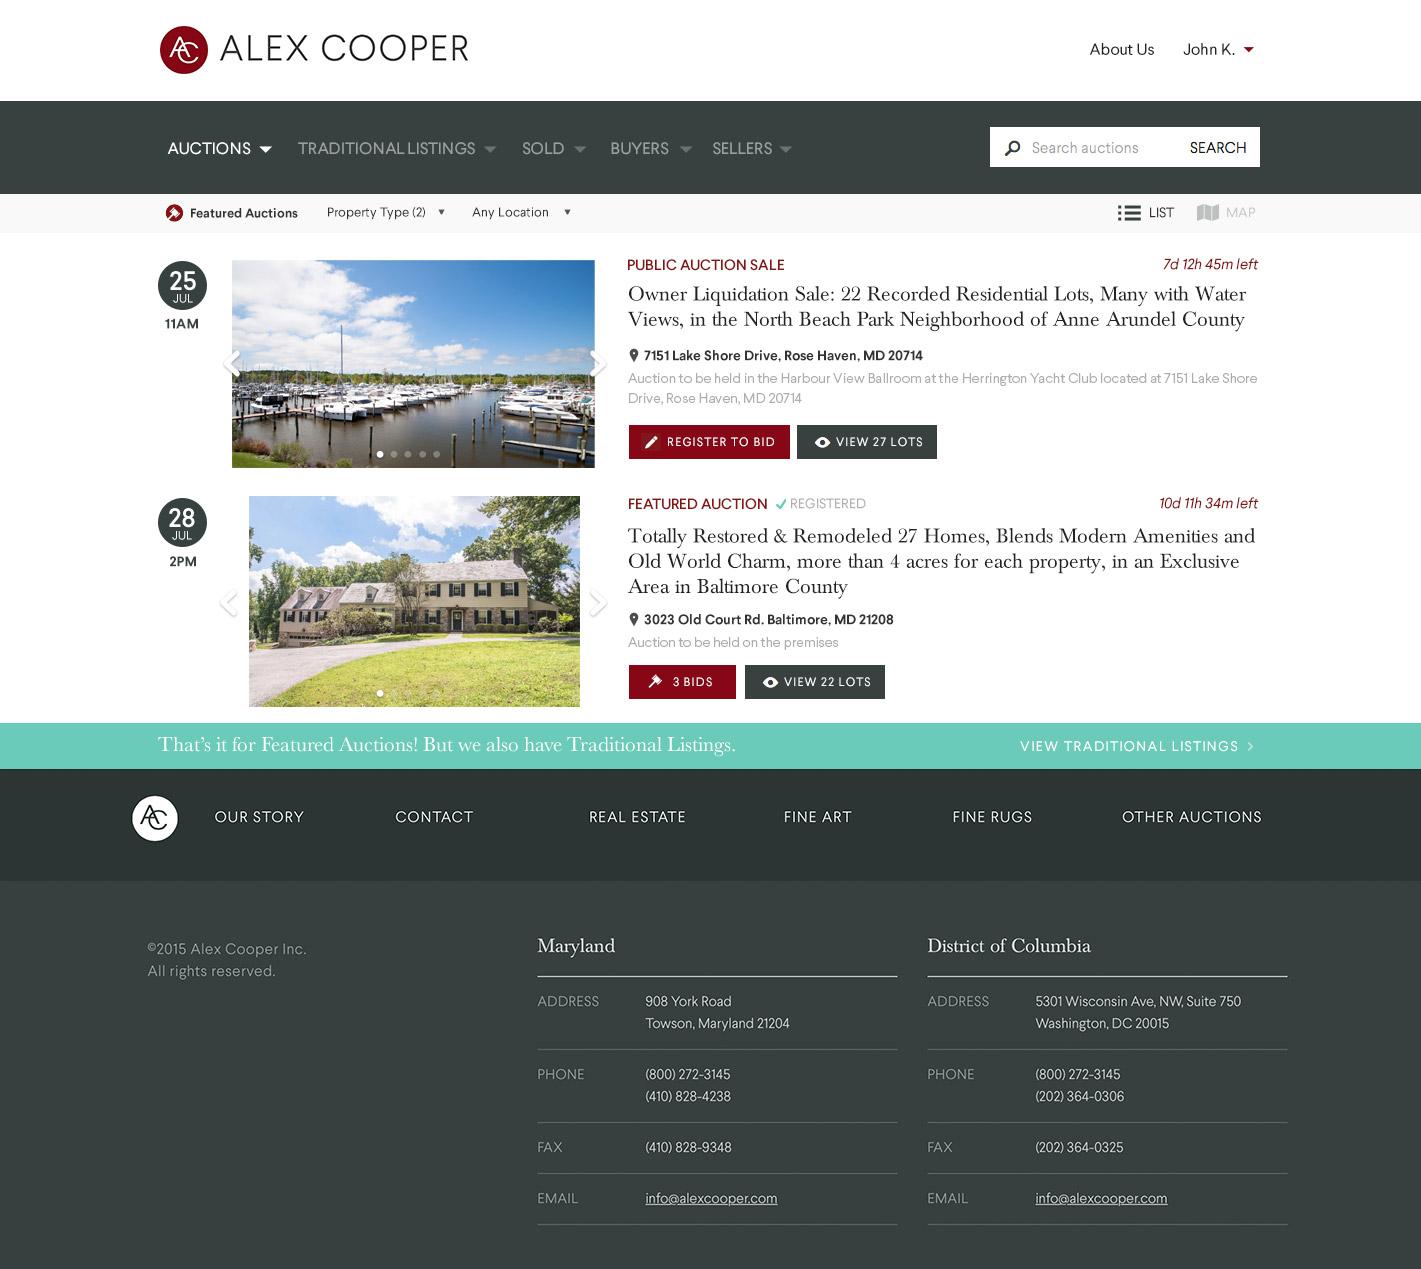 Website is still under development (November 2016)